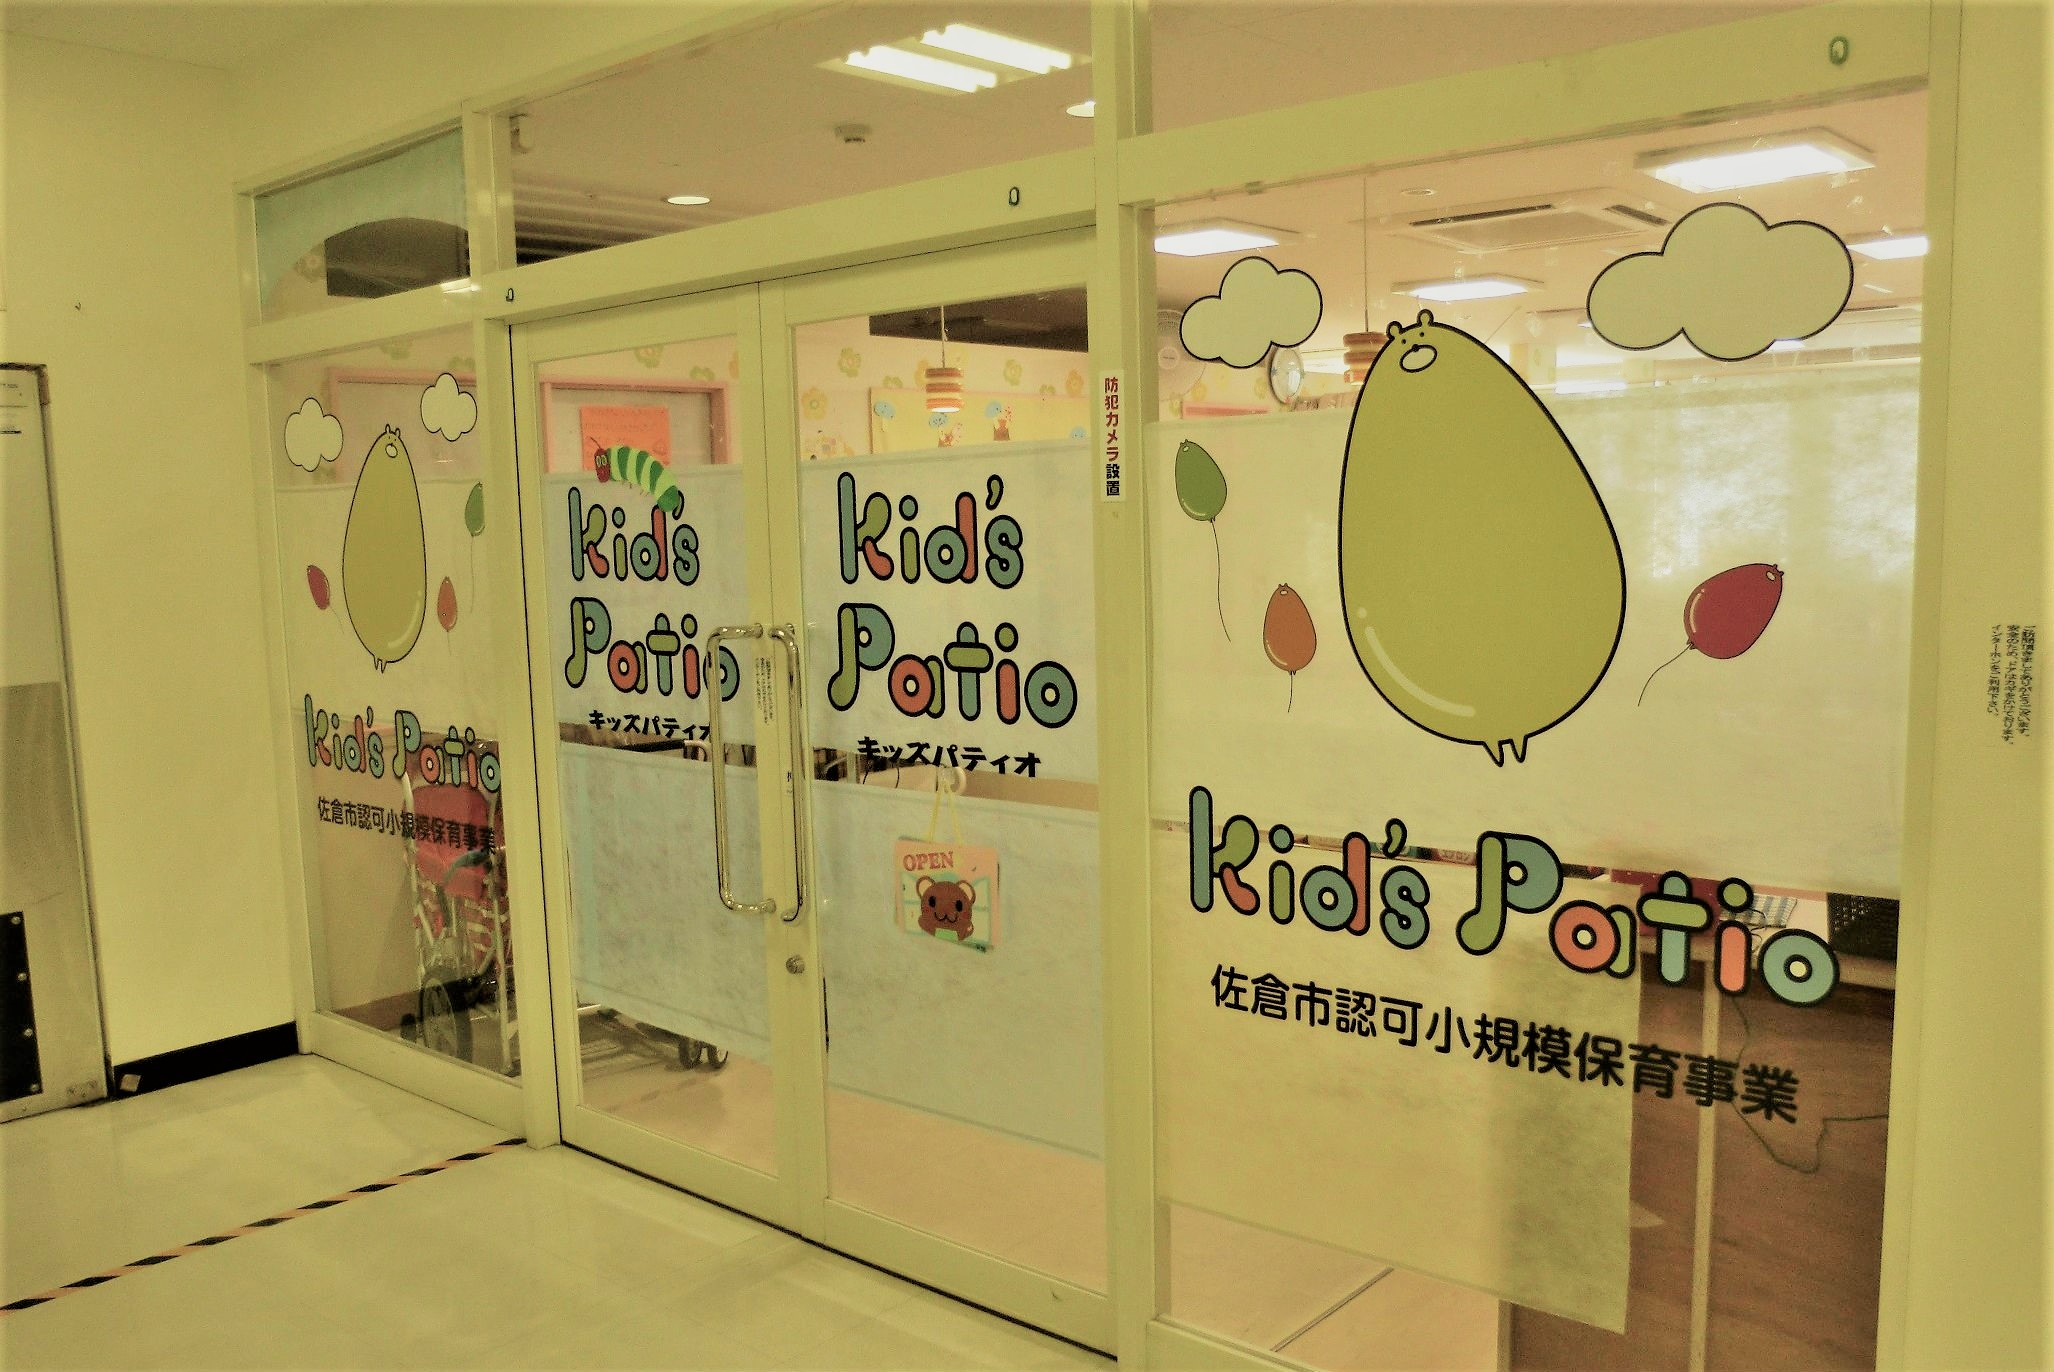 Kid'sPatioしづ園(千葉県佐倉市)